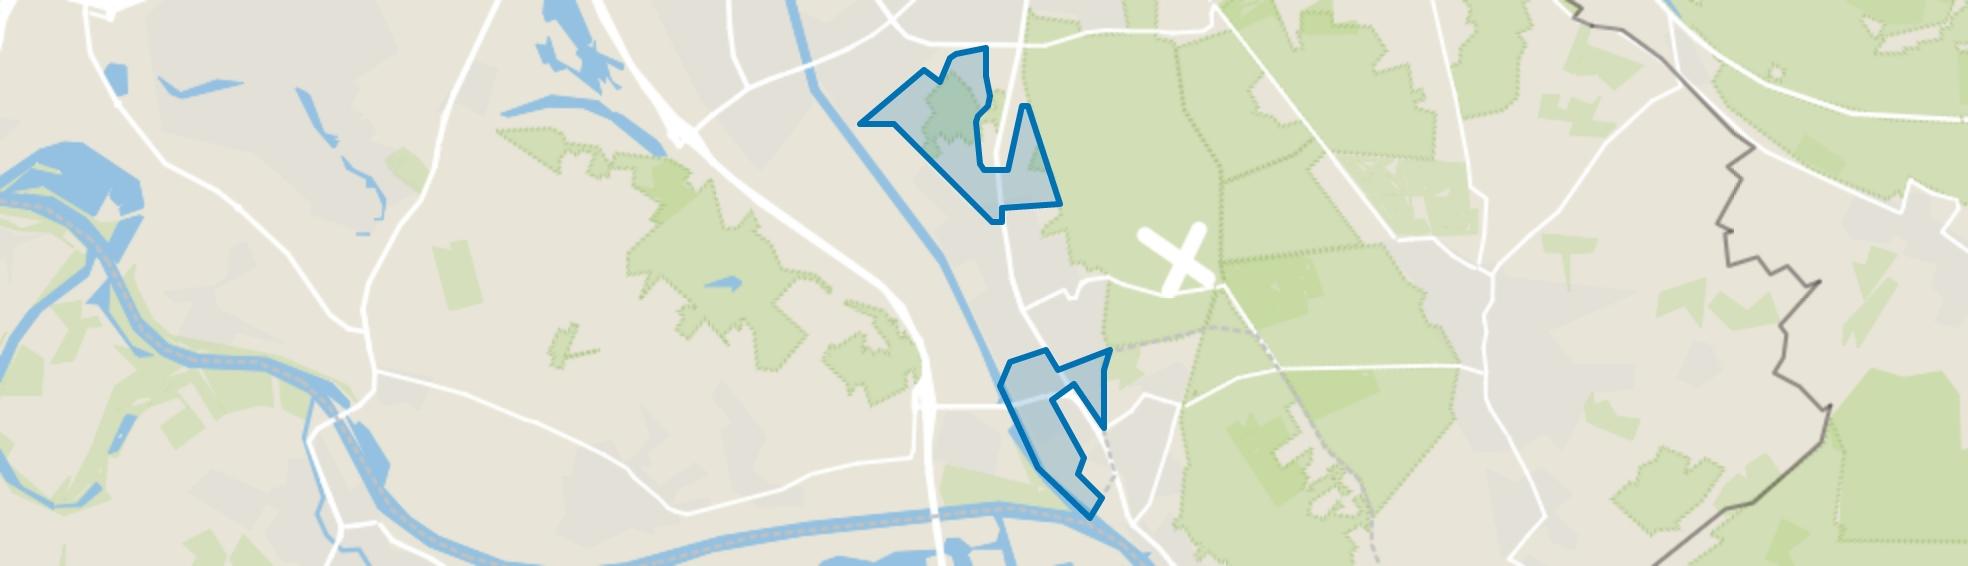 Verspreide huizen Malden, Malden map